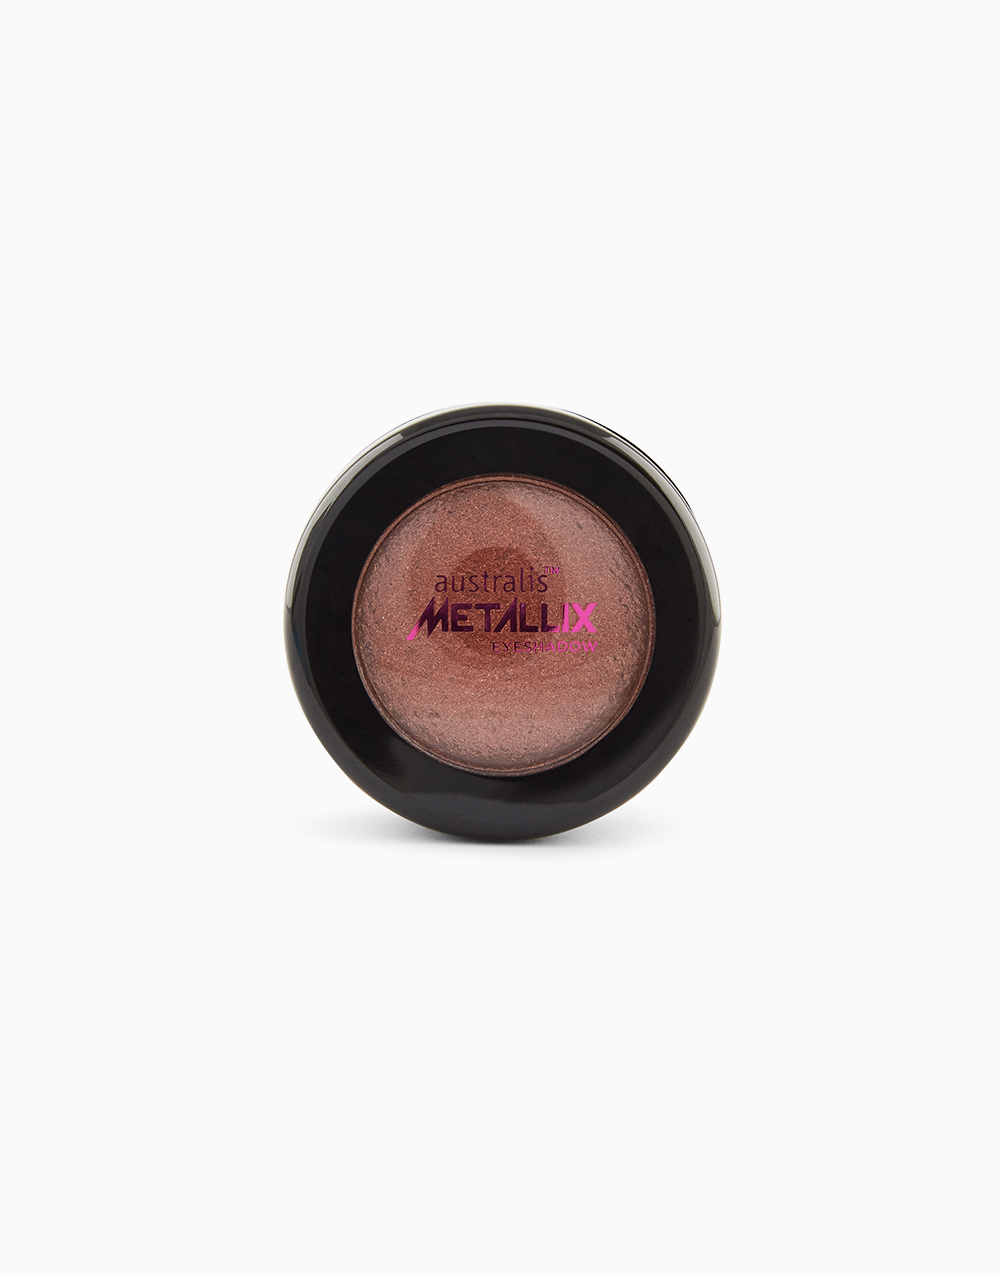 Metallix Eyeshadow by Australis | Bronze Marley